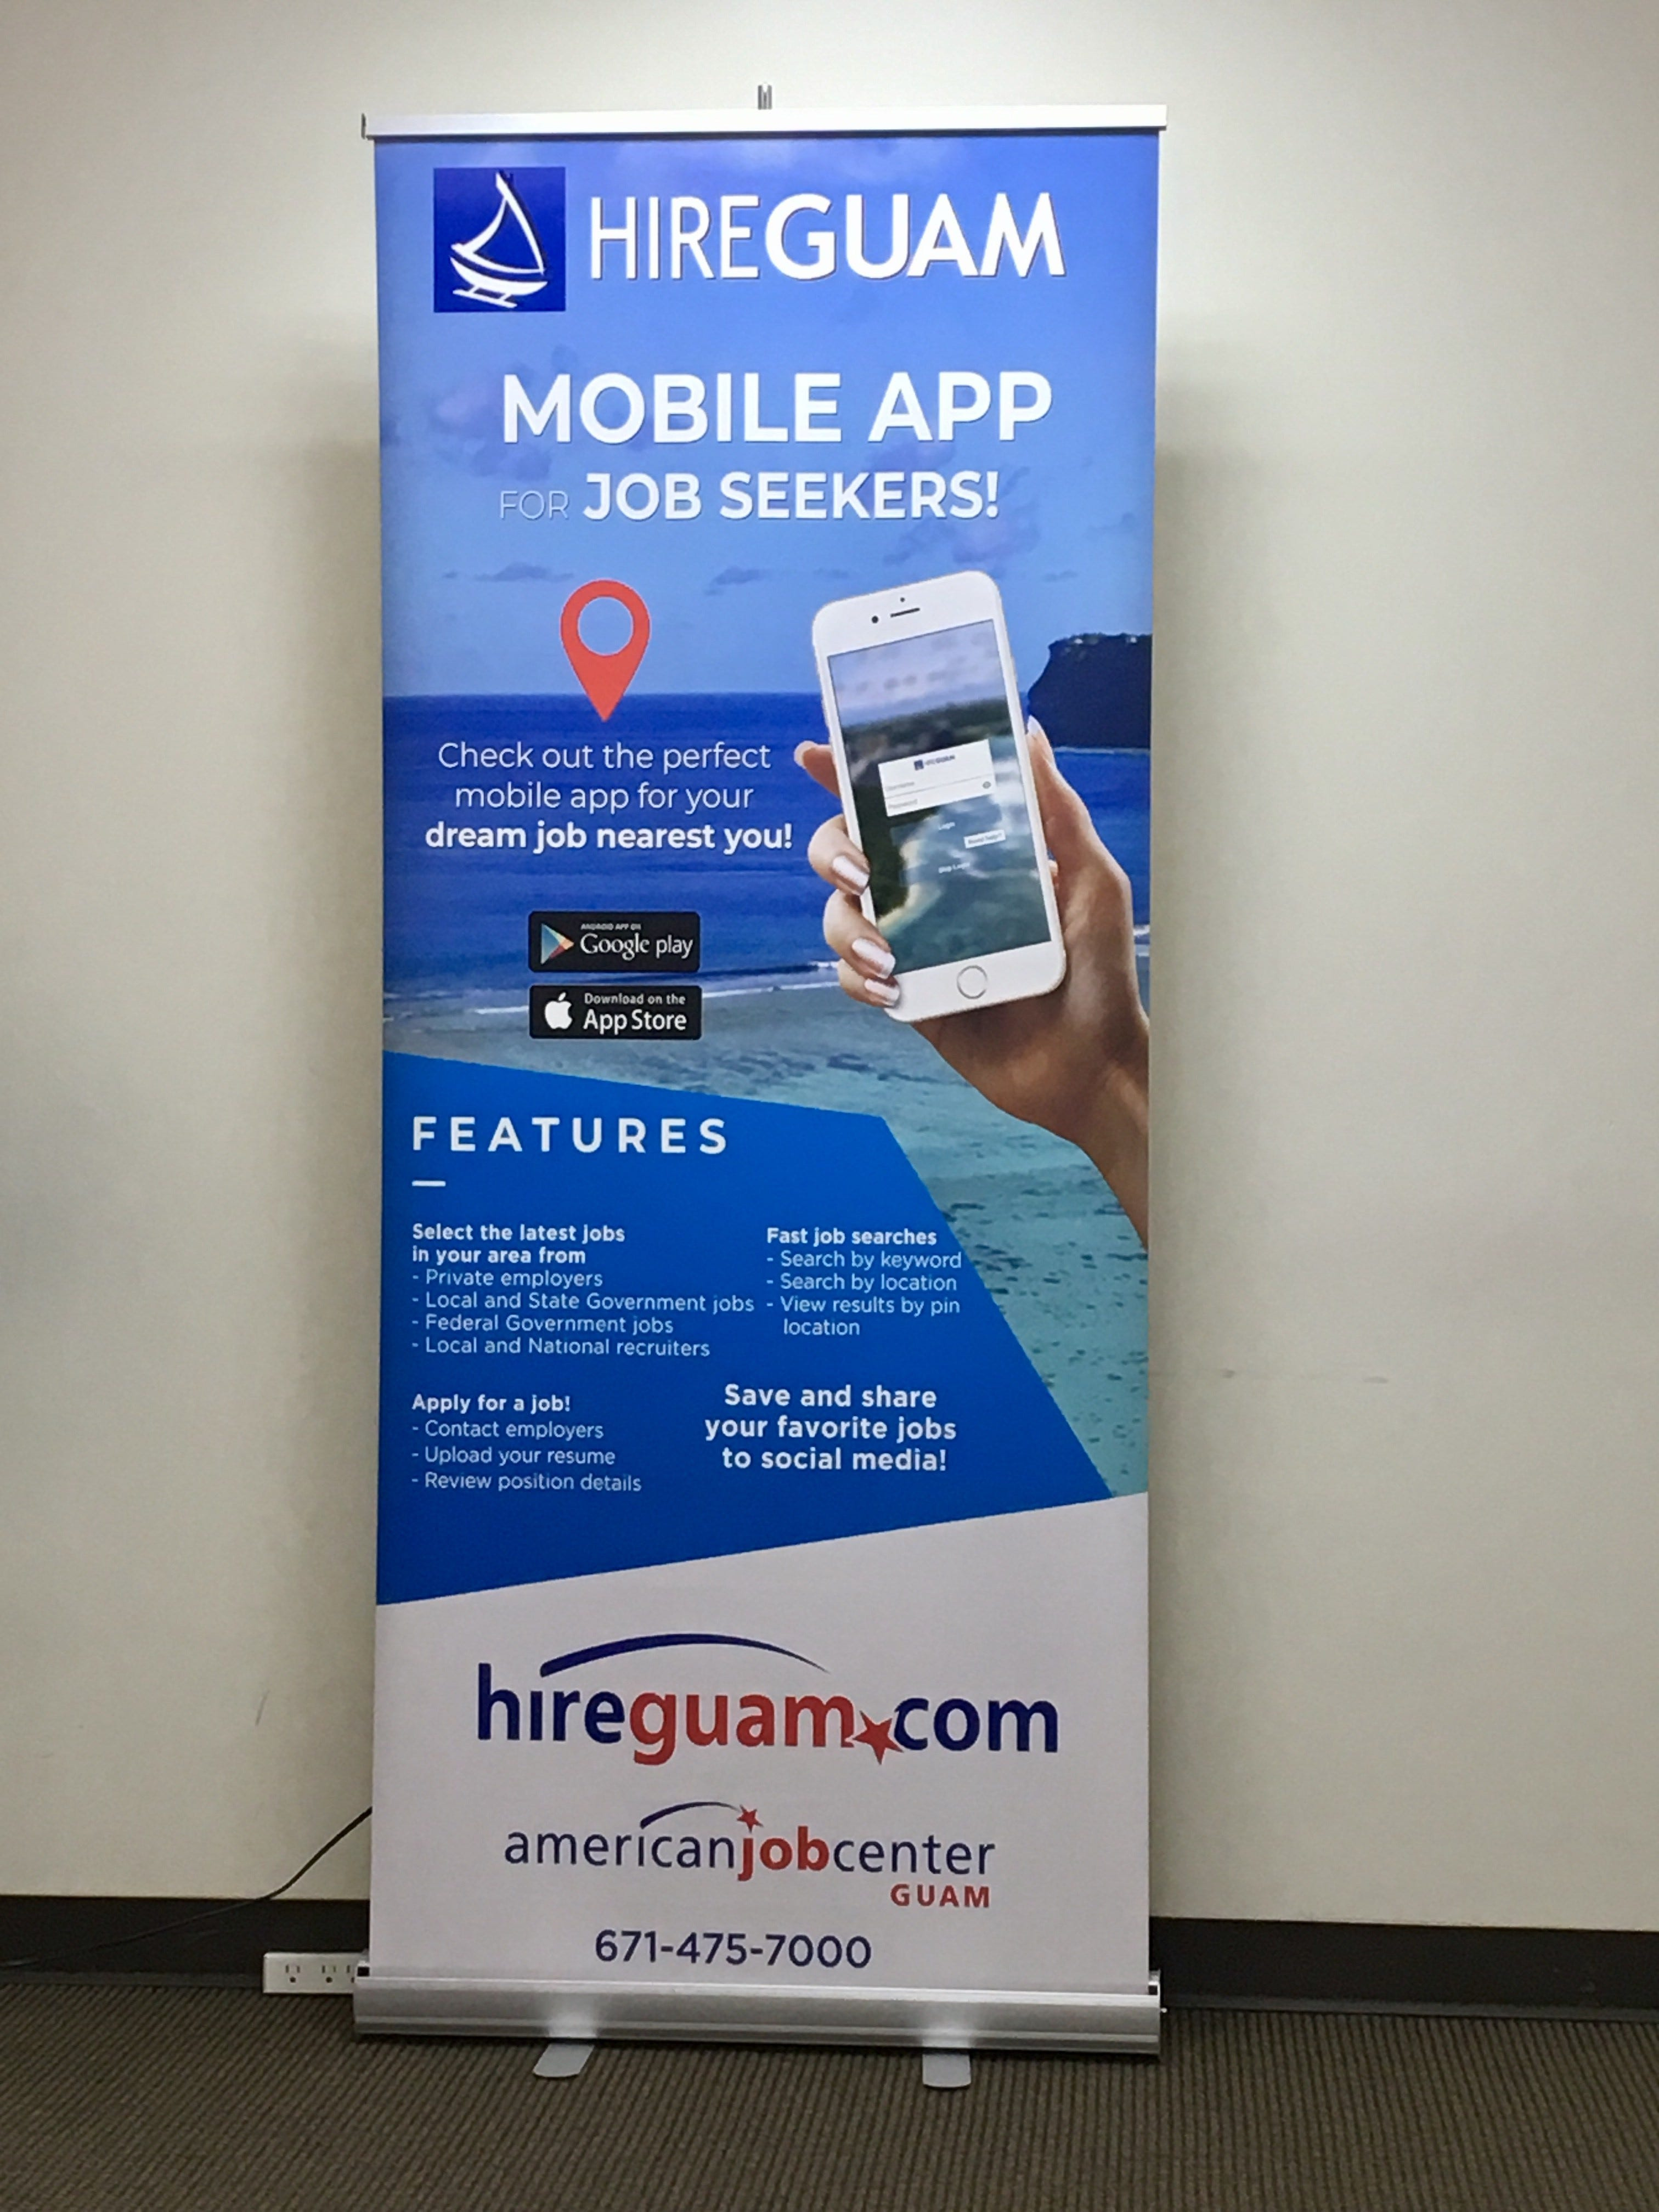 HireGuam app launches